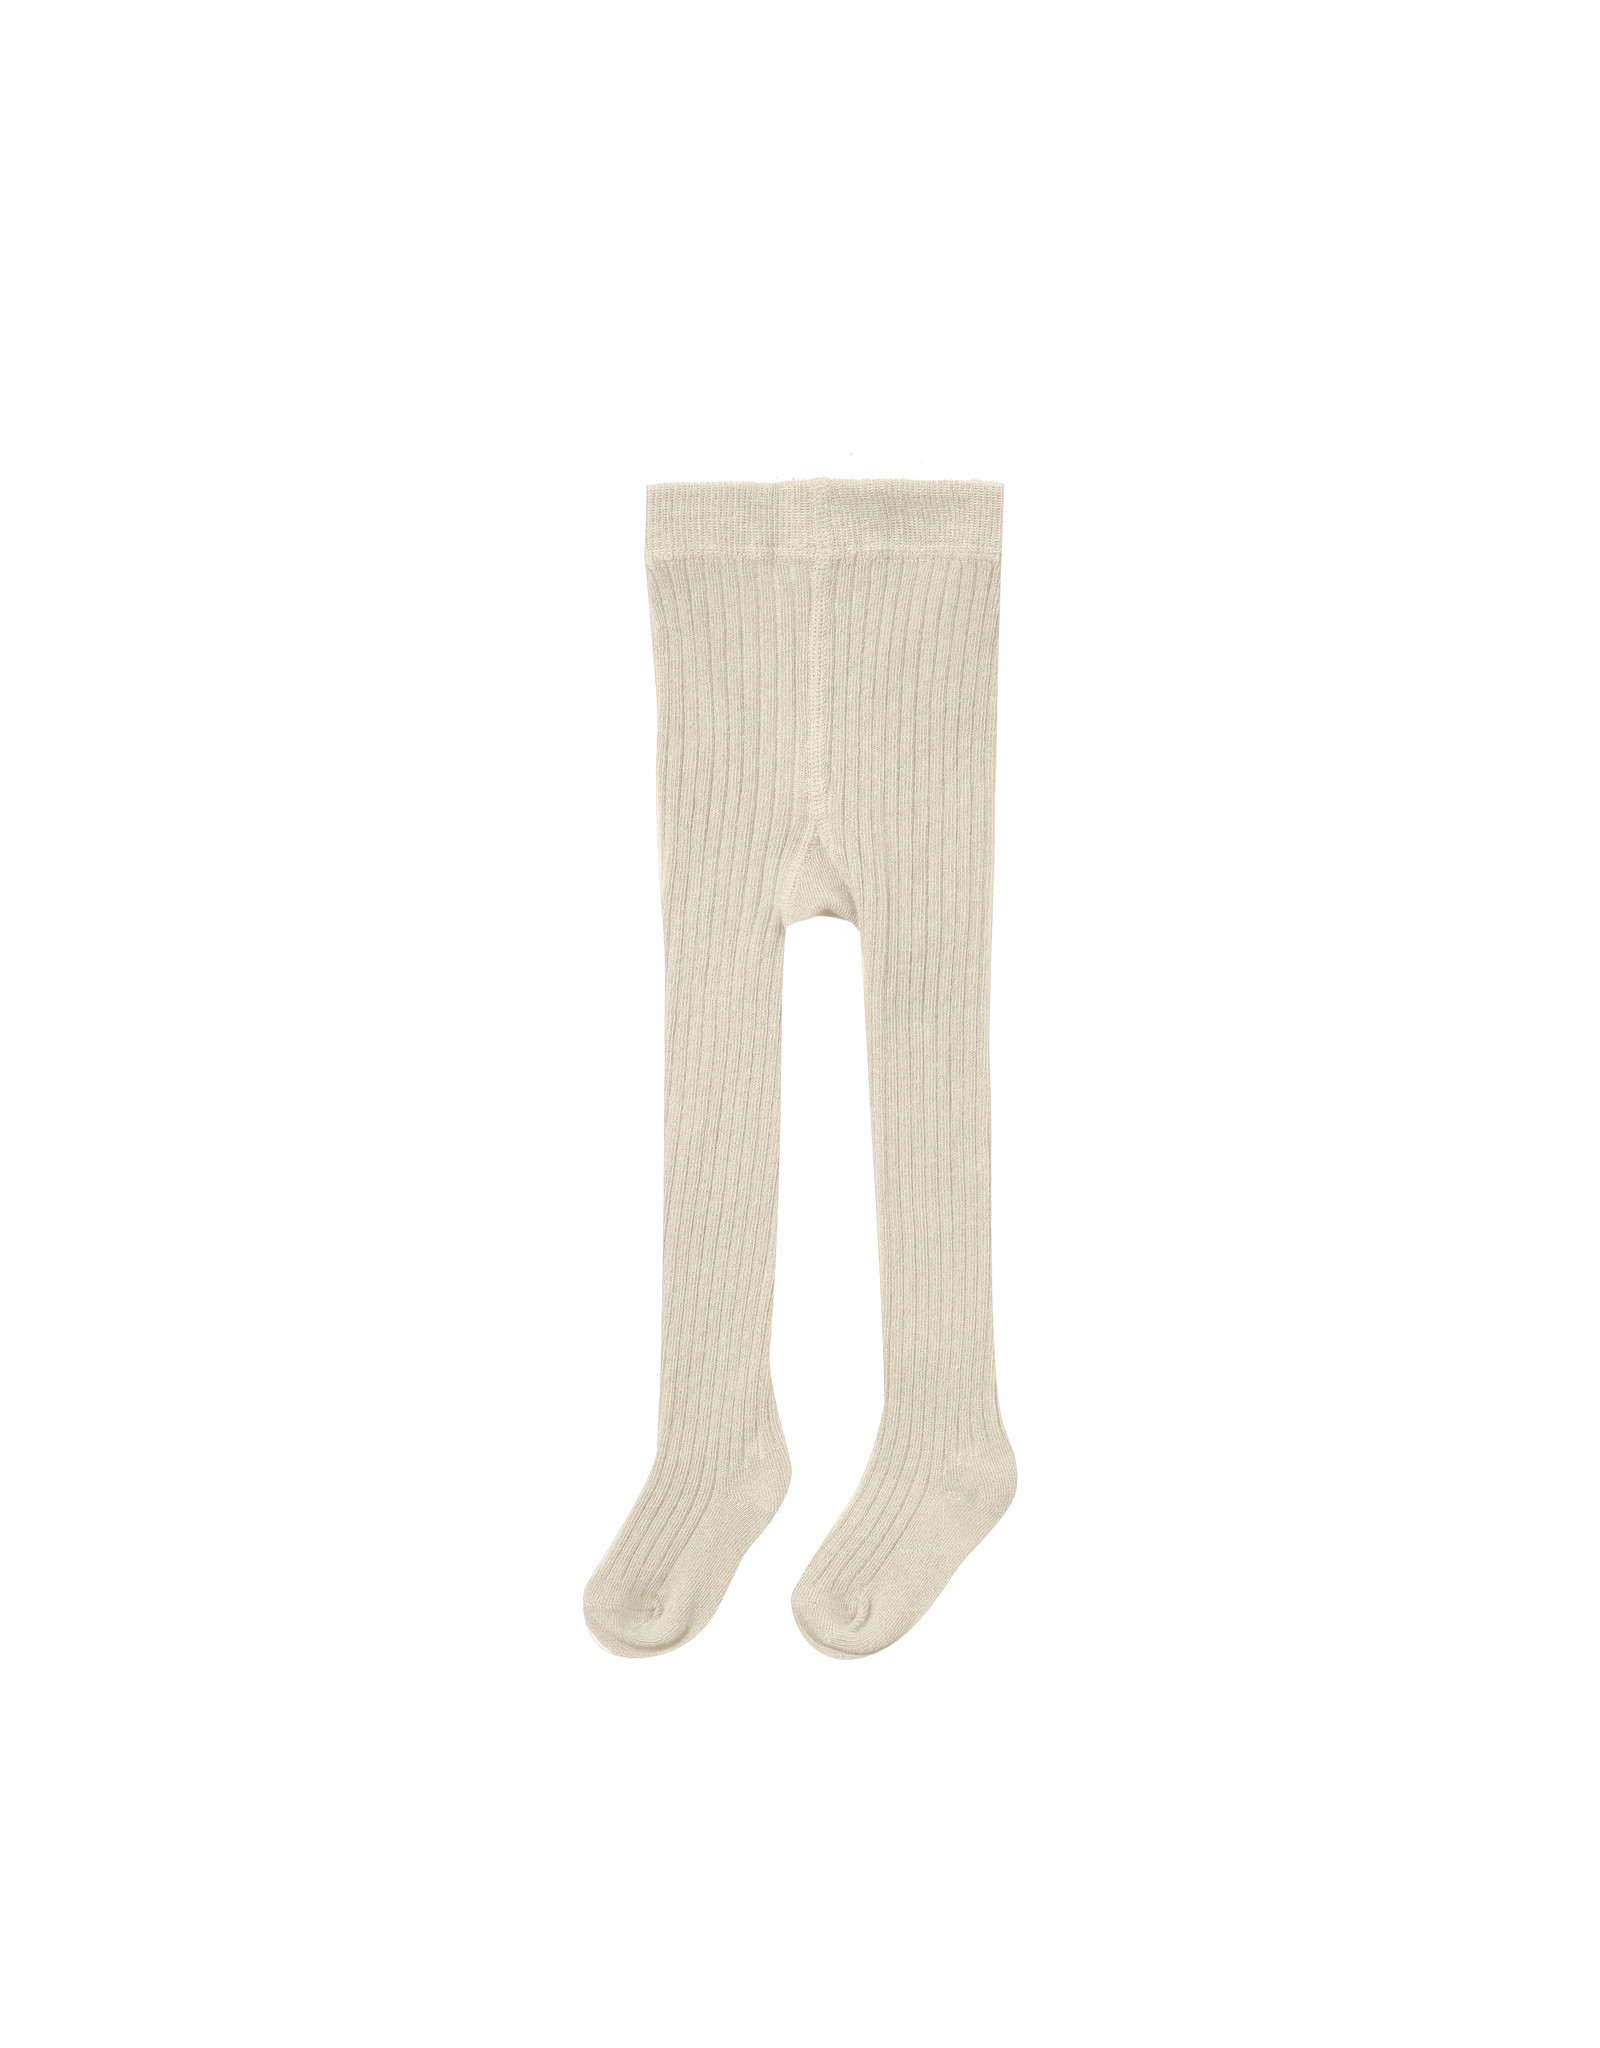 Rylee + Cru Rib Knit Tights - Natural